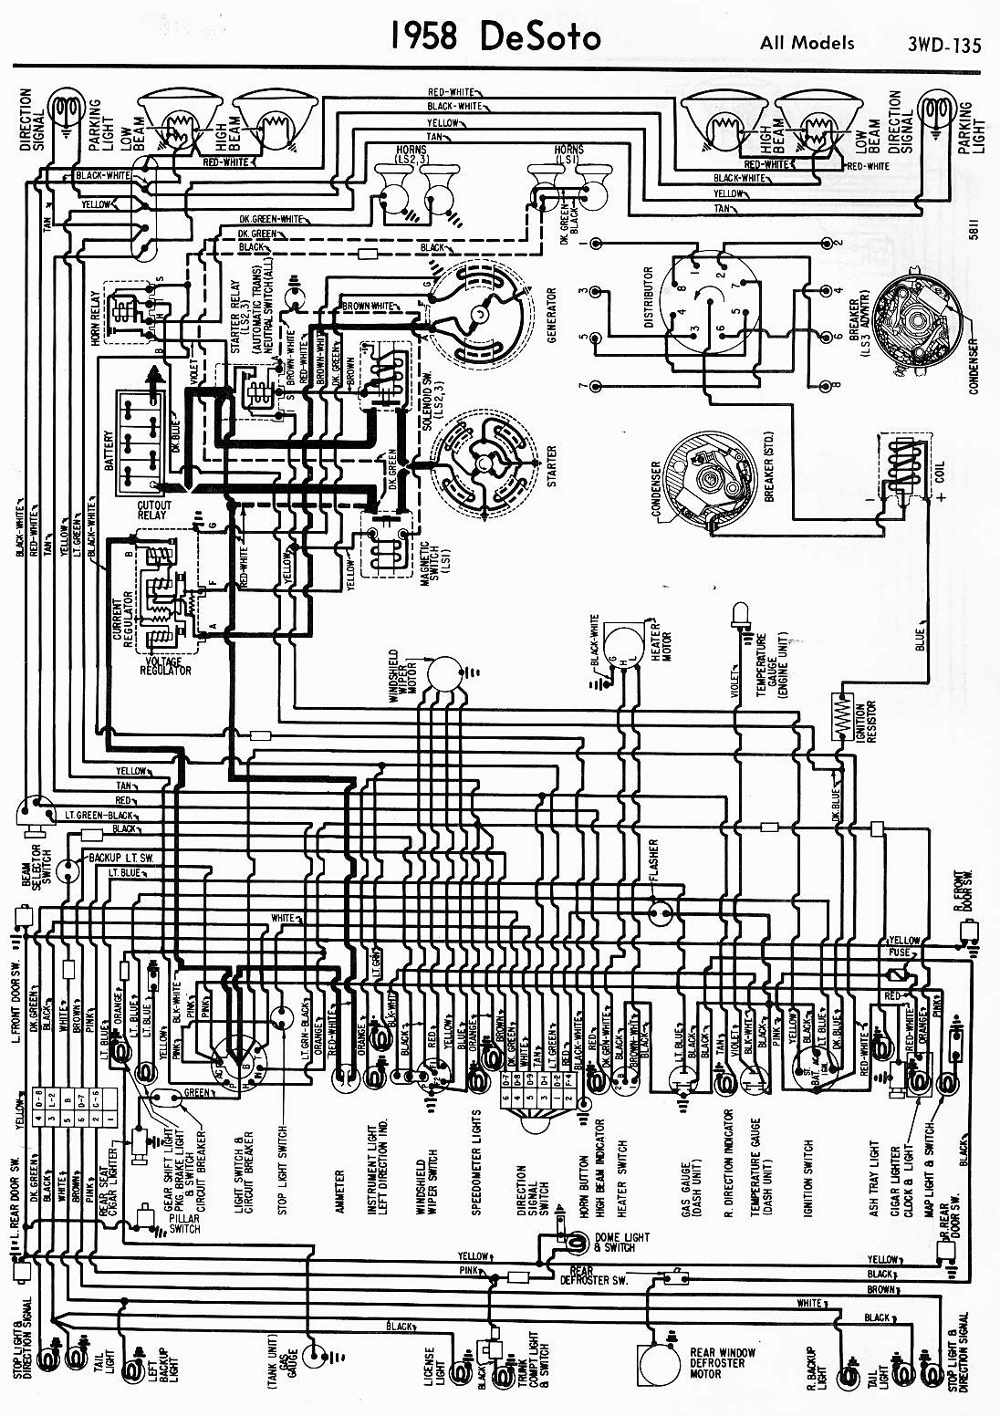 1959 desoto wiring diagram wiring diagram Car Wiring Diagrams 1950 desoto wiring diagram schematic best wiring library